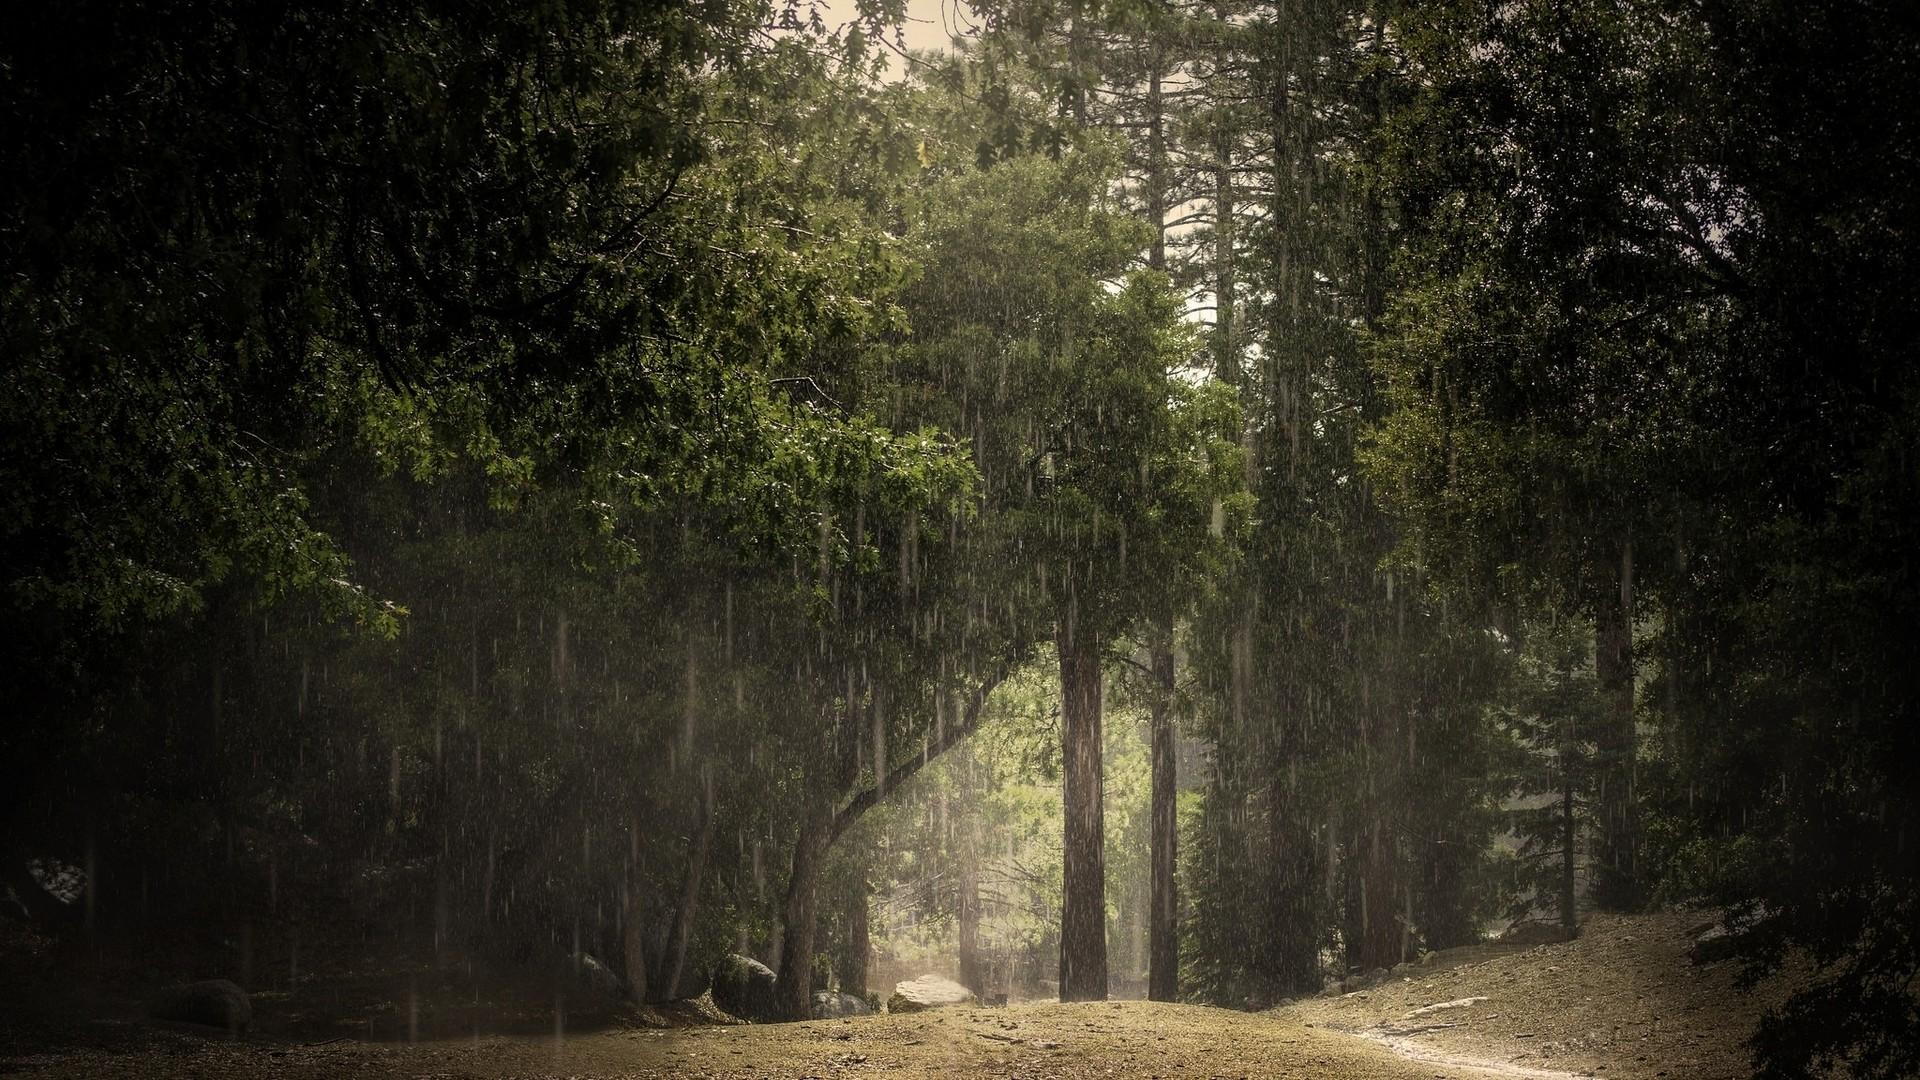 Rainy forest HD Wallpaper 1920×1080